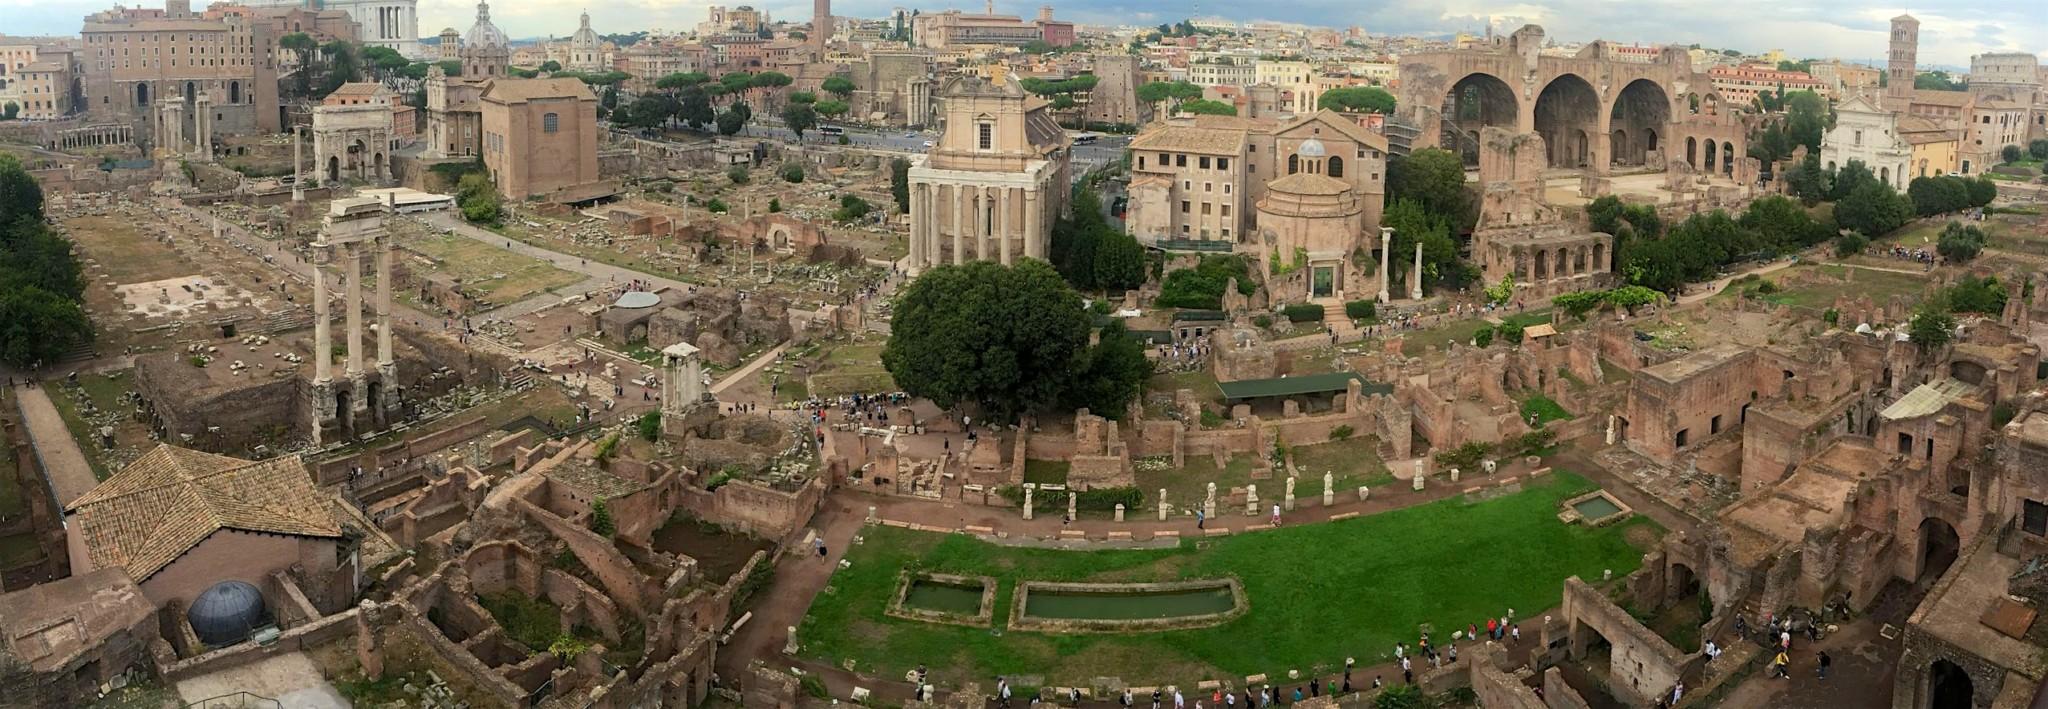 roman_forum_from_palatine_hill_9-9-16